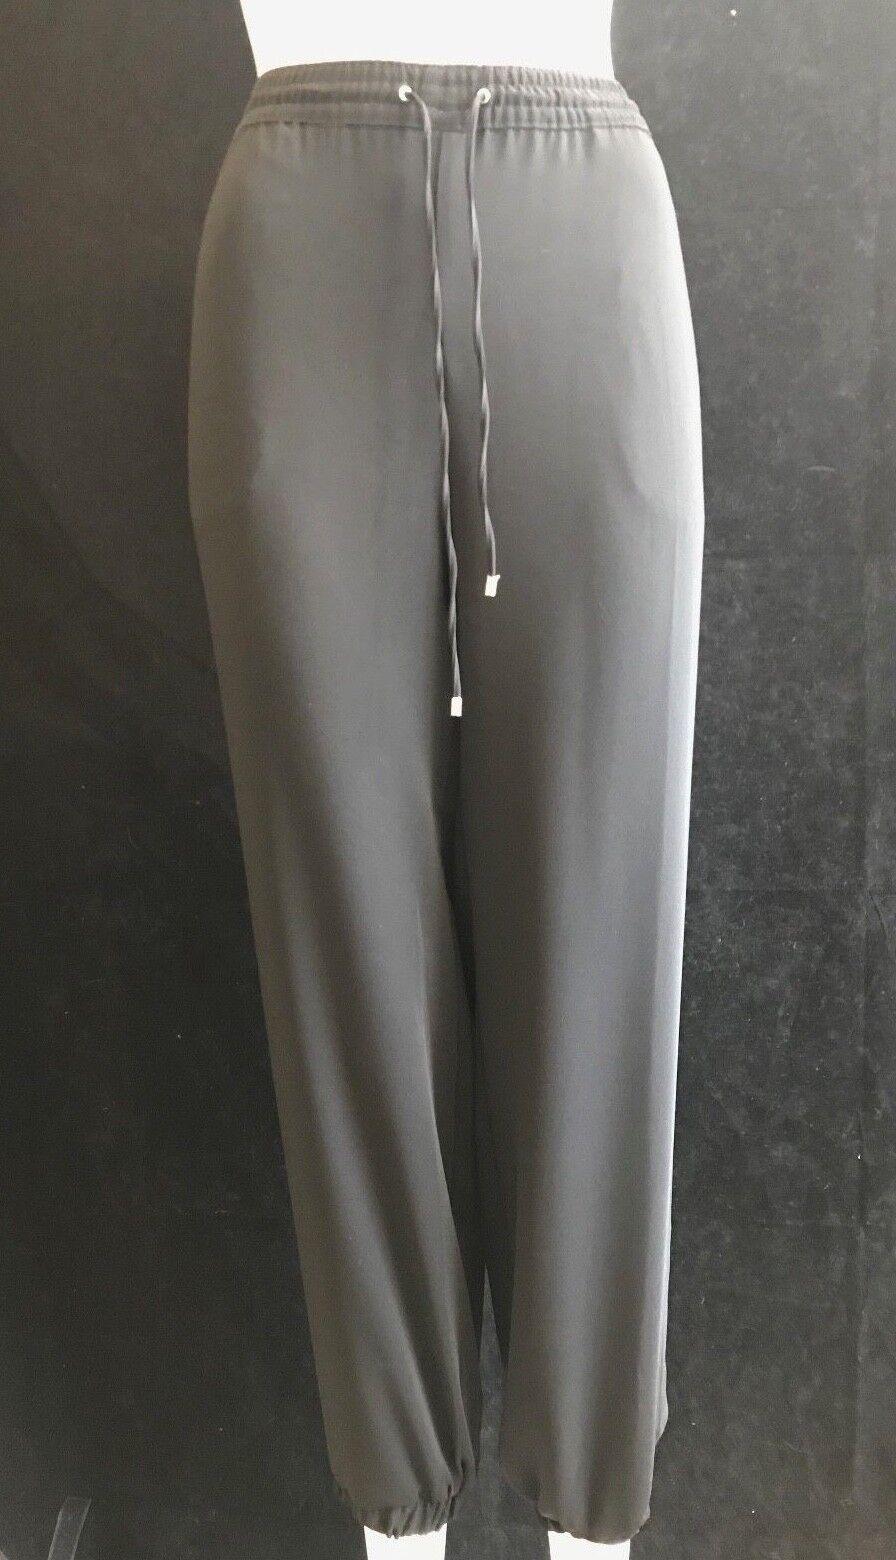 BNWT RALPH LAUREN da Donna Polo nero Casual Pantaloni Leggero UK12 US 8